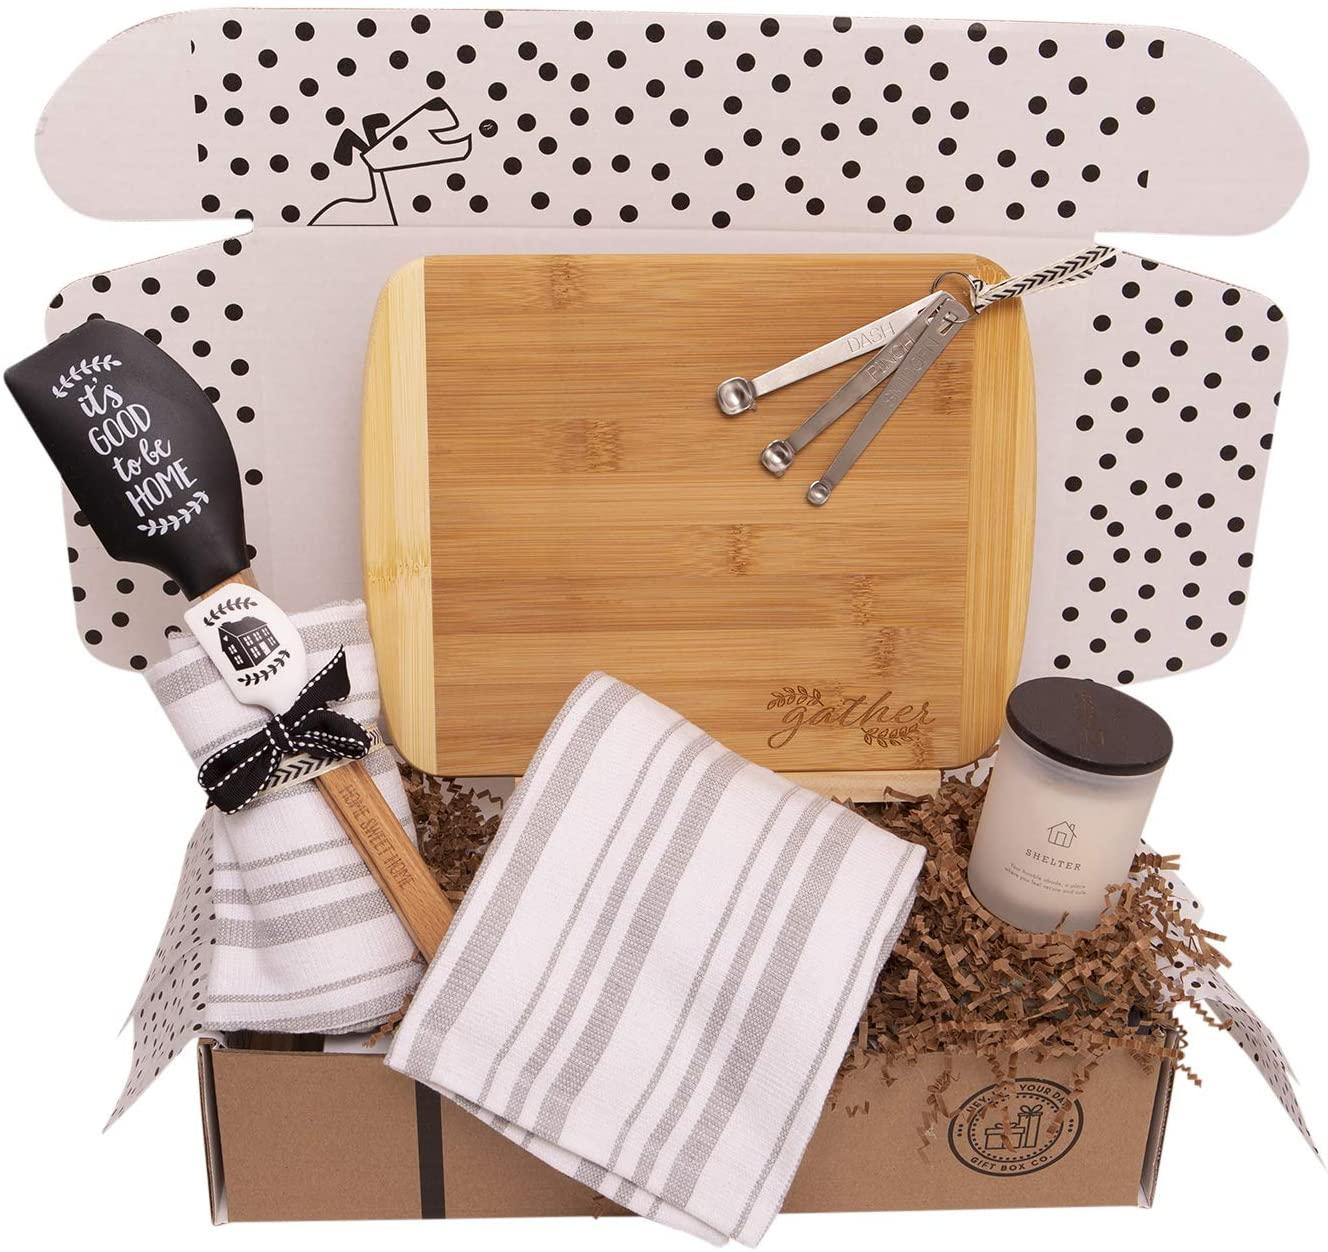 housewarming-gift-baskets-kitchen-items